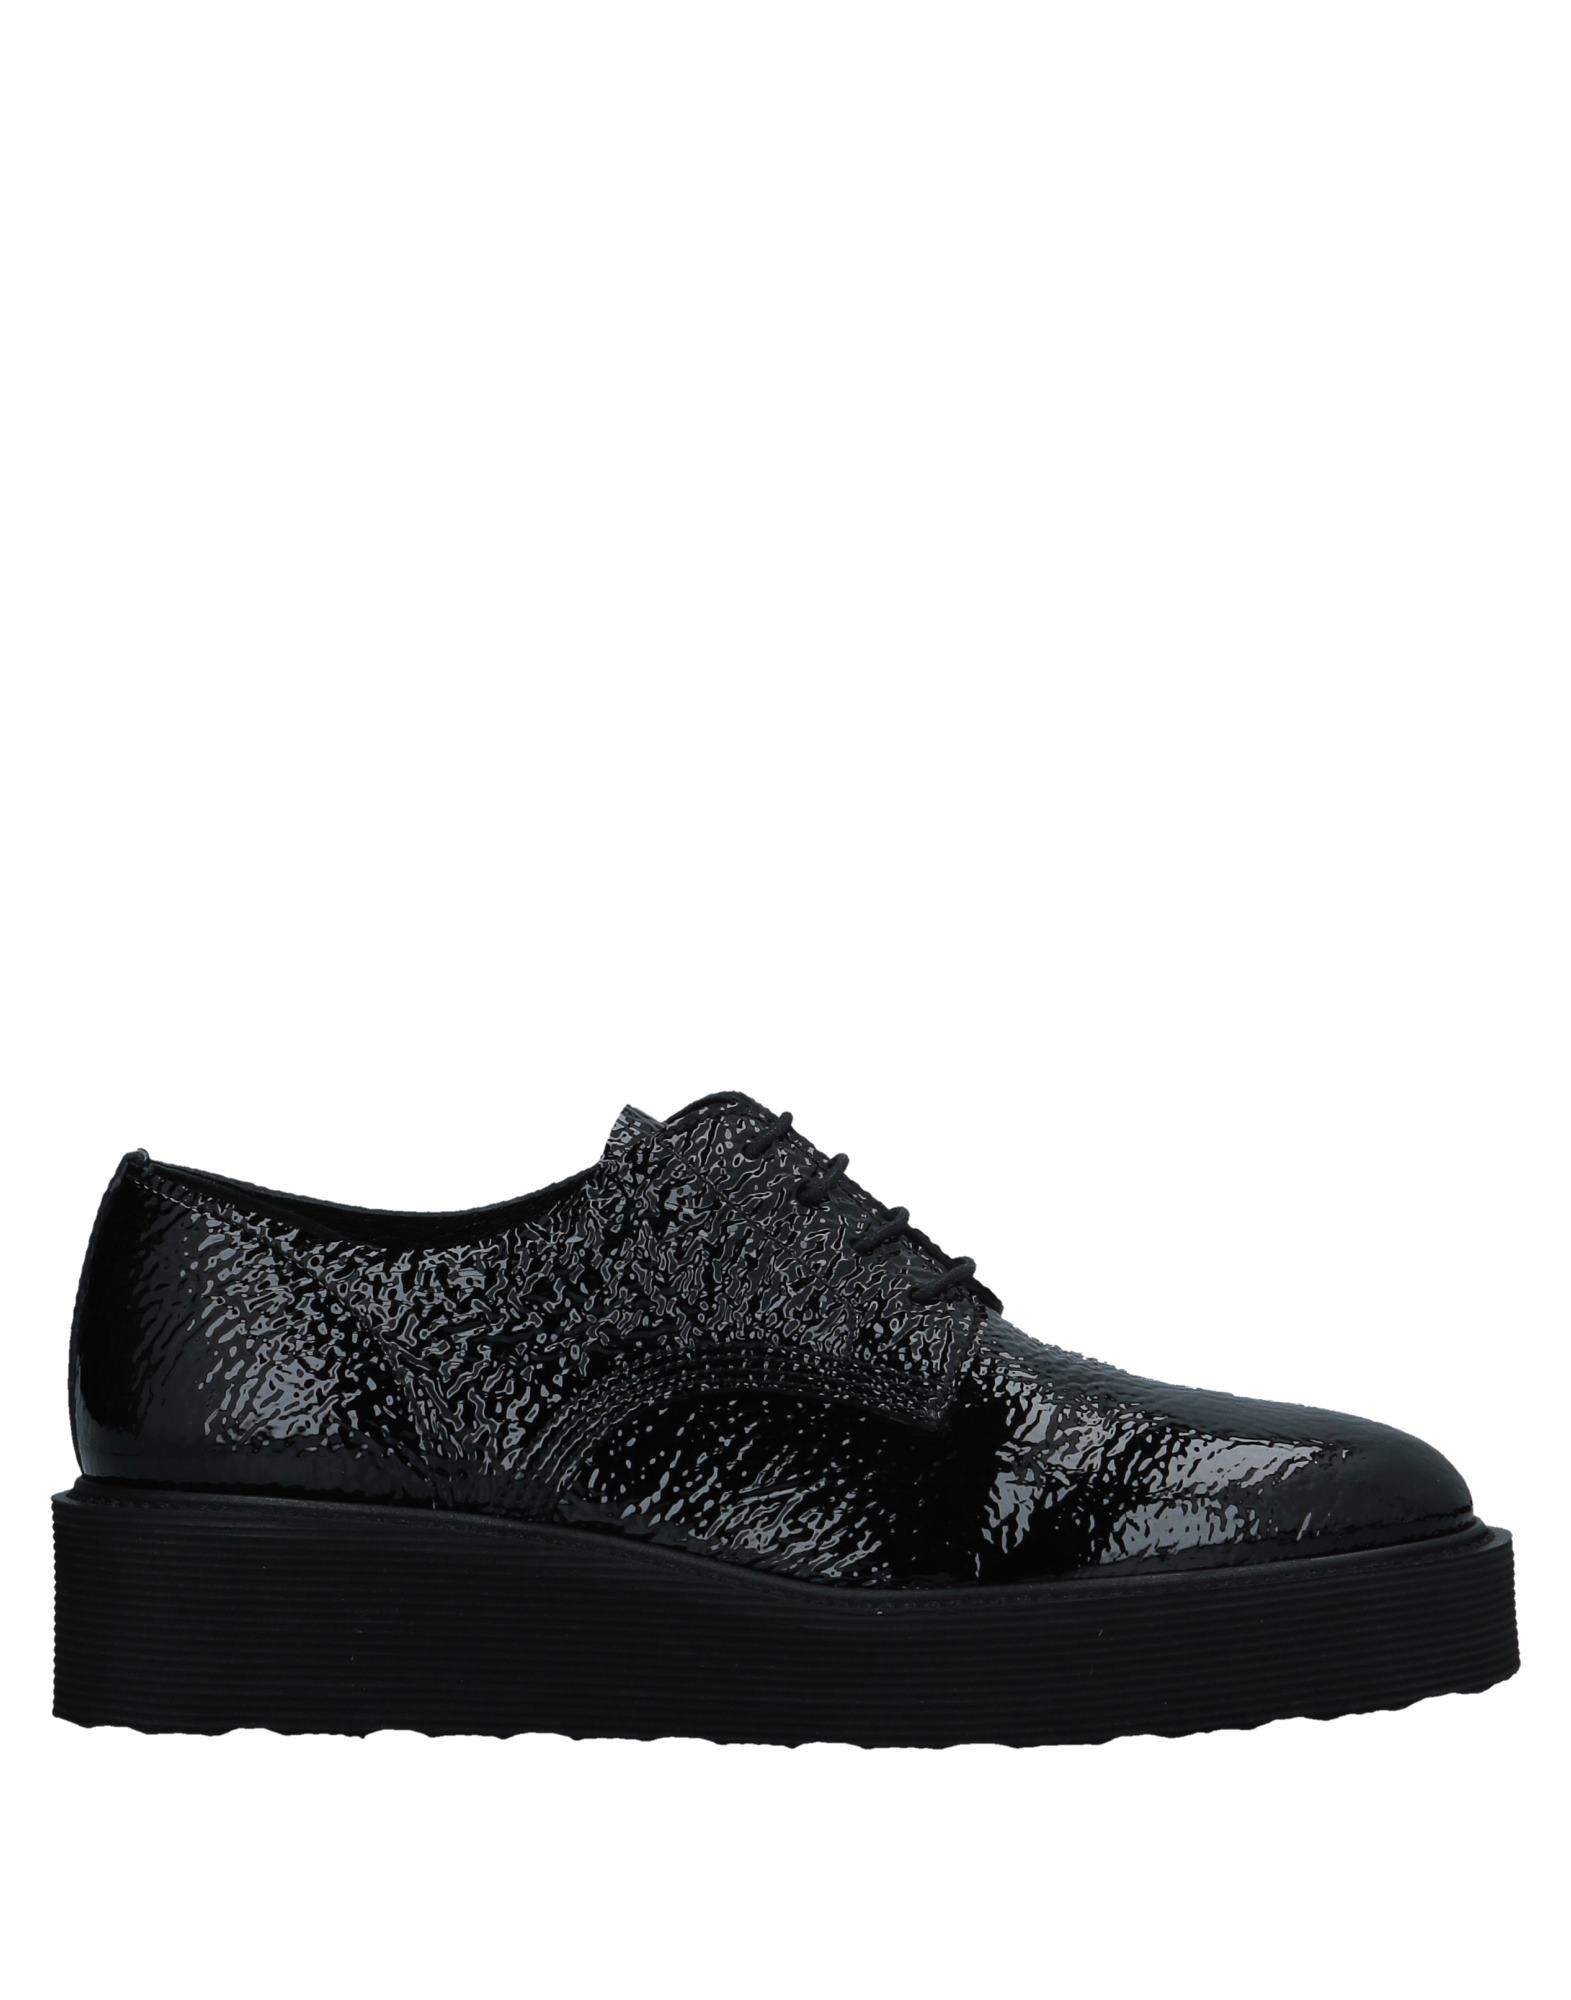 PREMIATA Обувь на шнурках обувь shoiberg